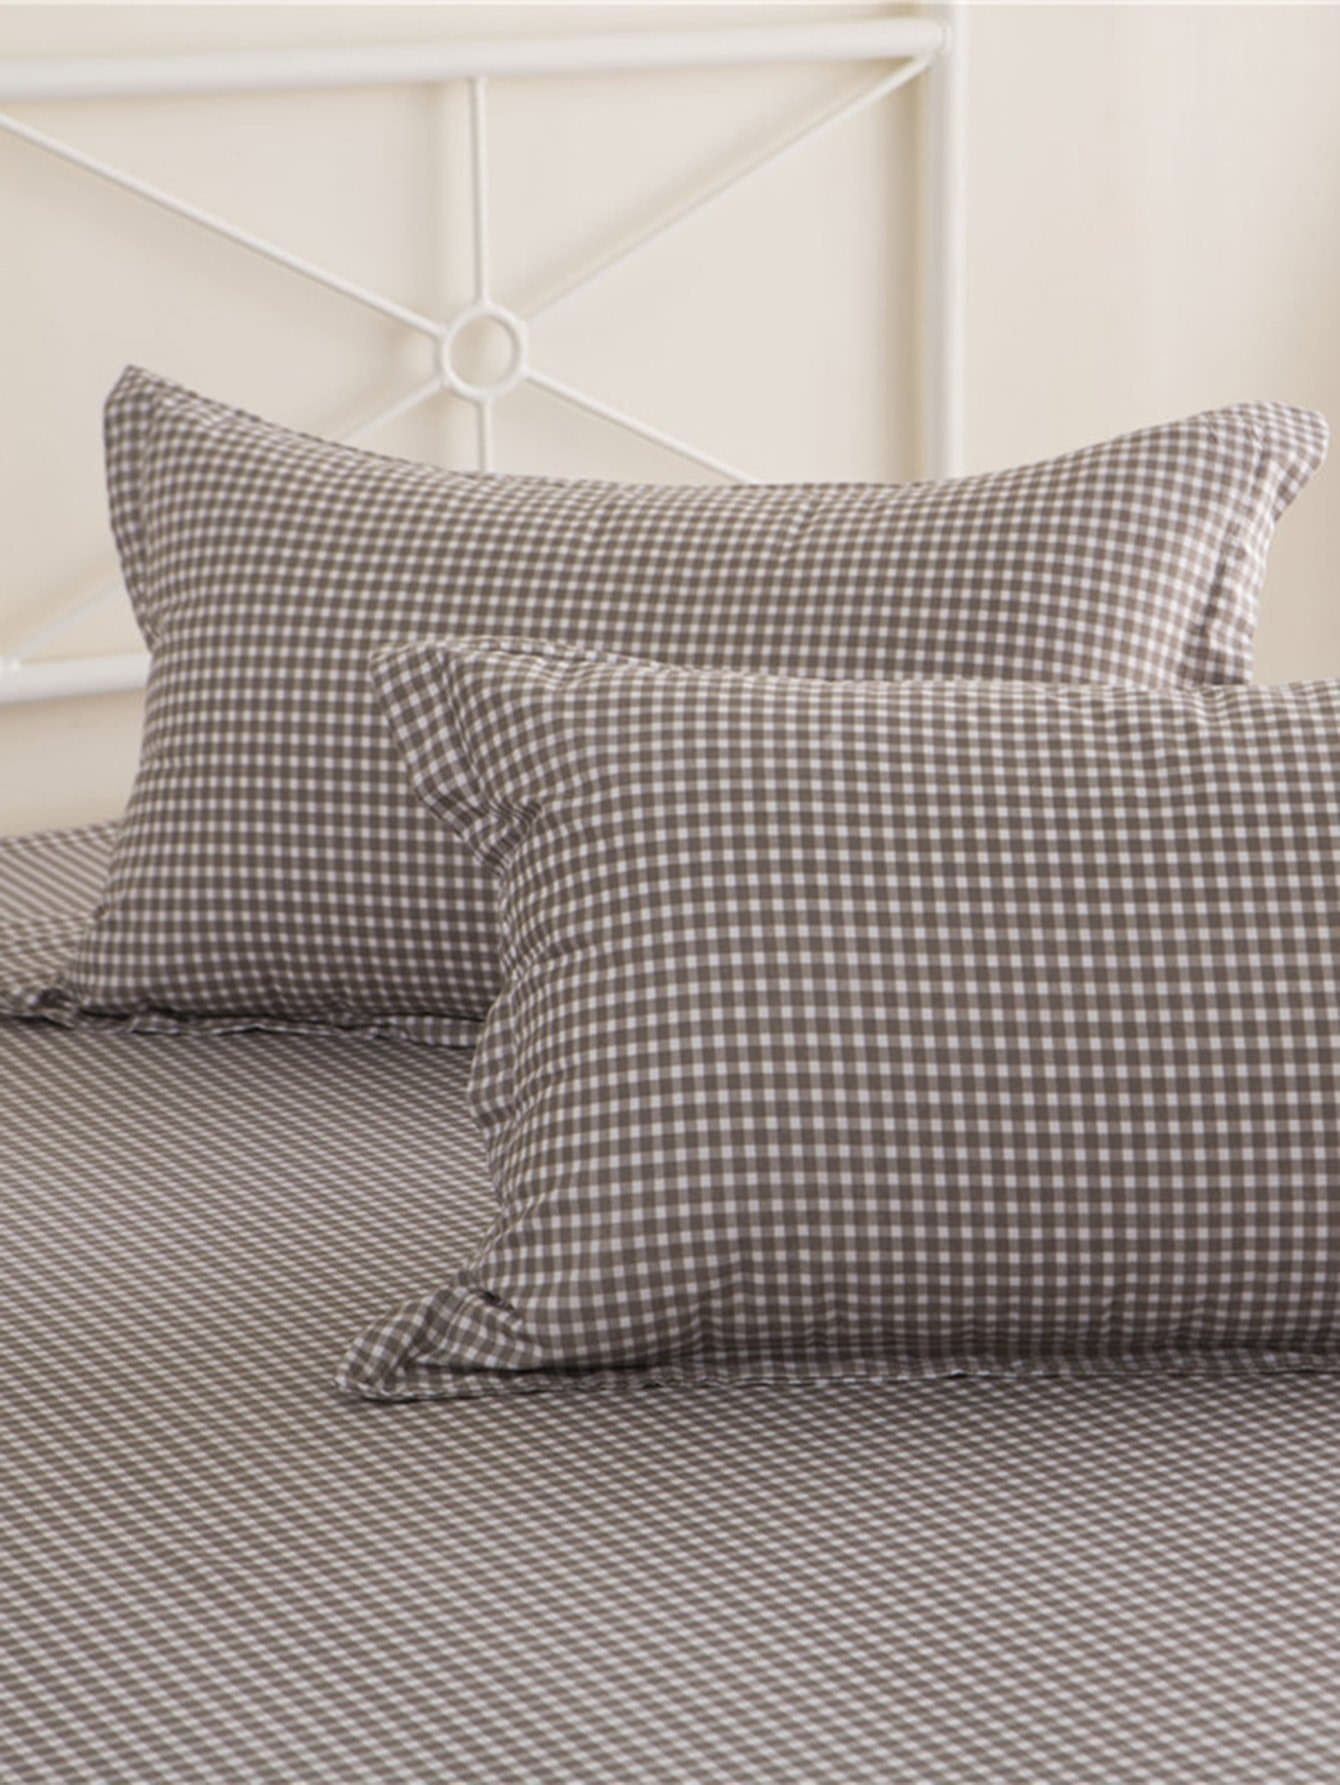 4pcs bettlaken set mit plaid muster german shein sheinside. Black Bedroom Furniture Sets. Home Design Ideas